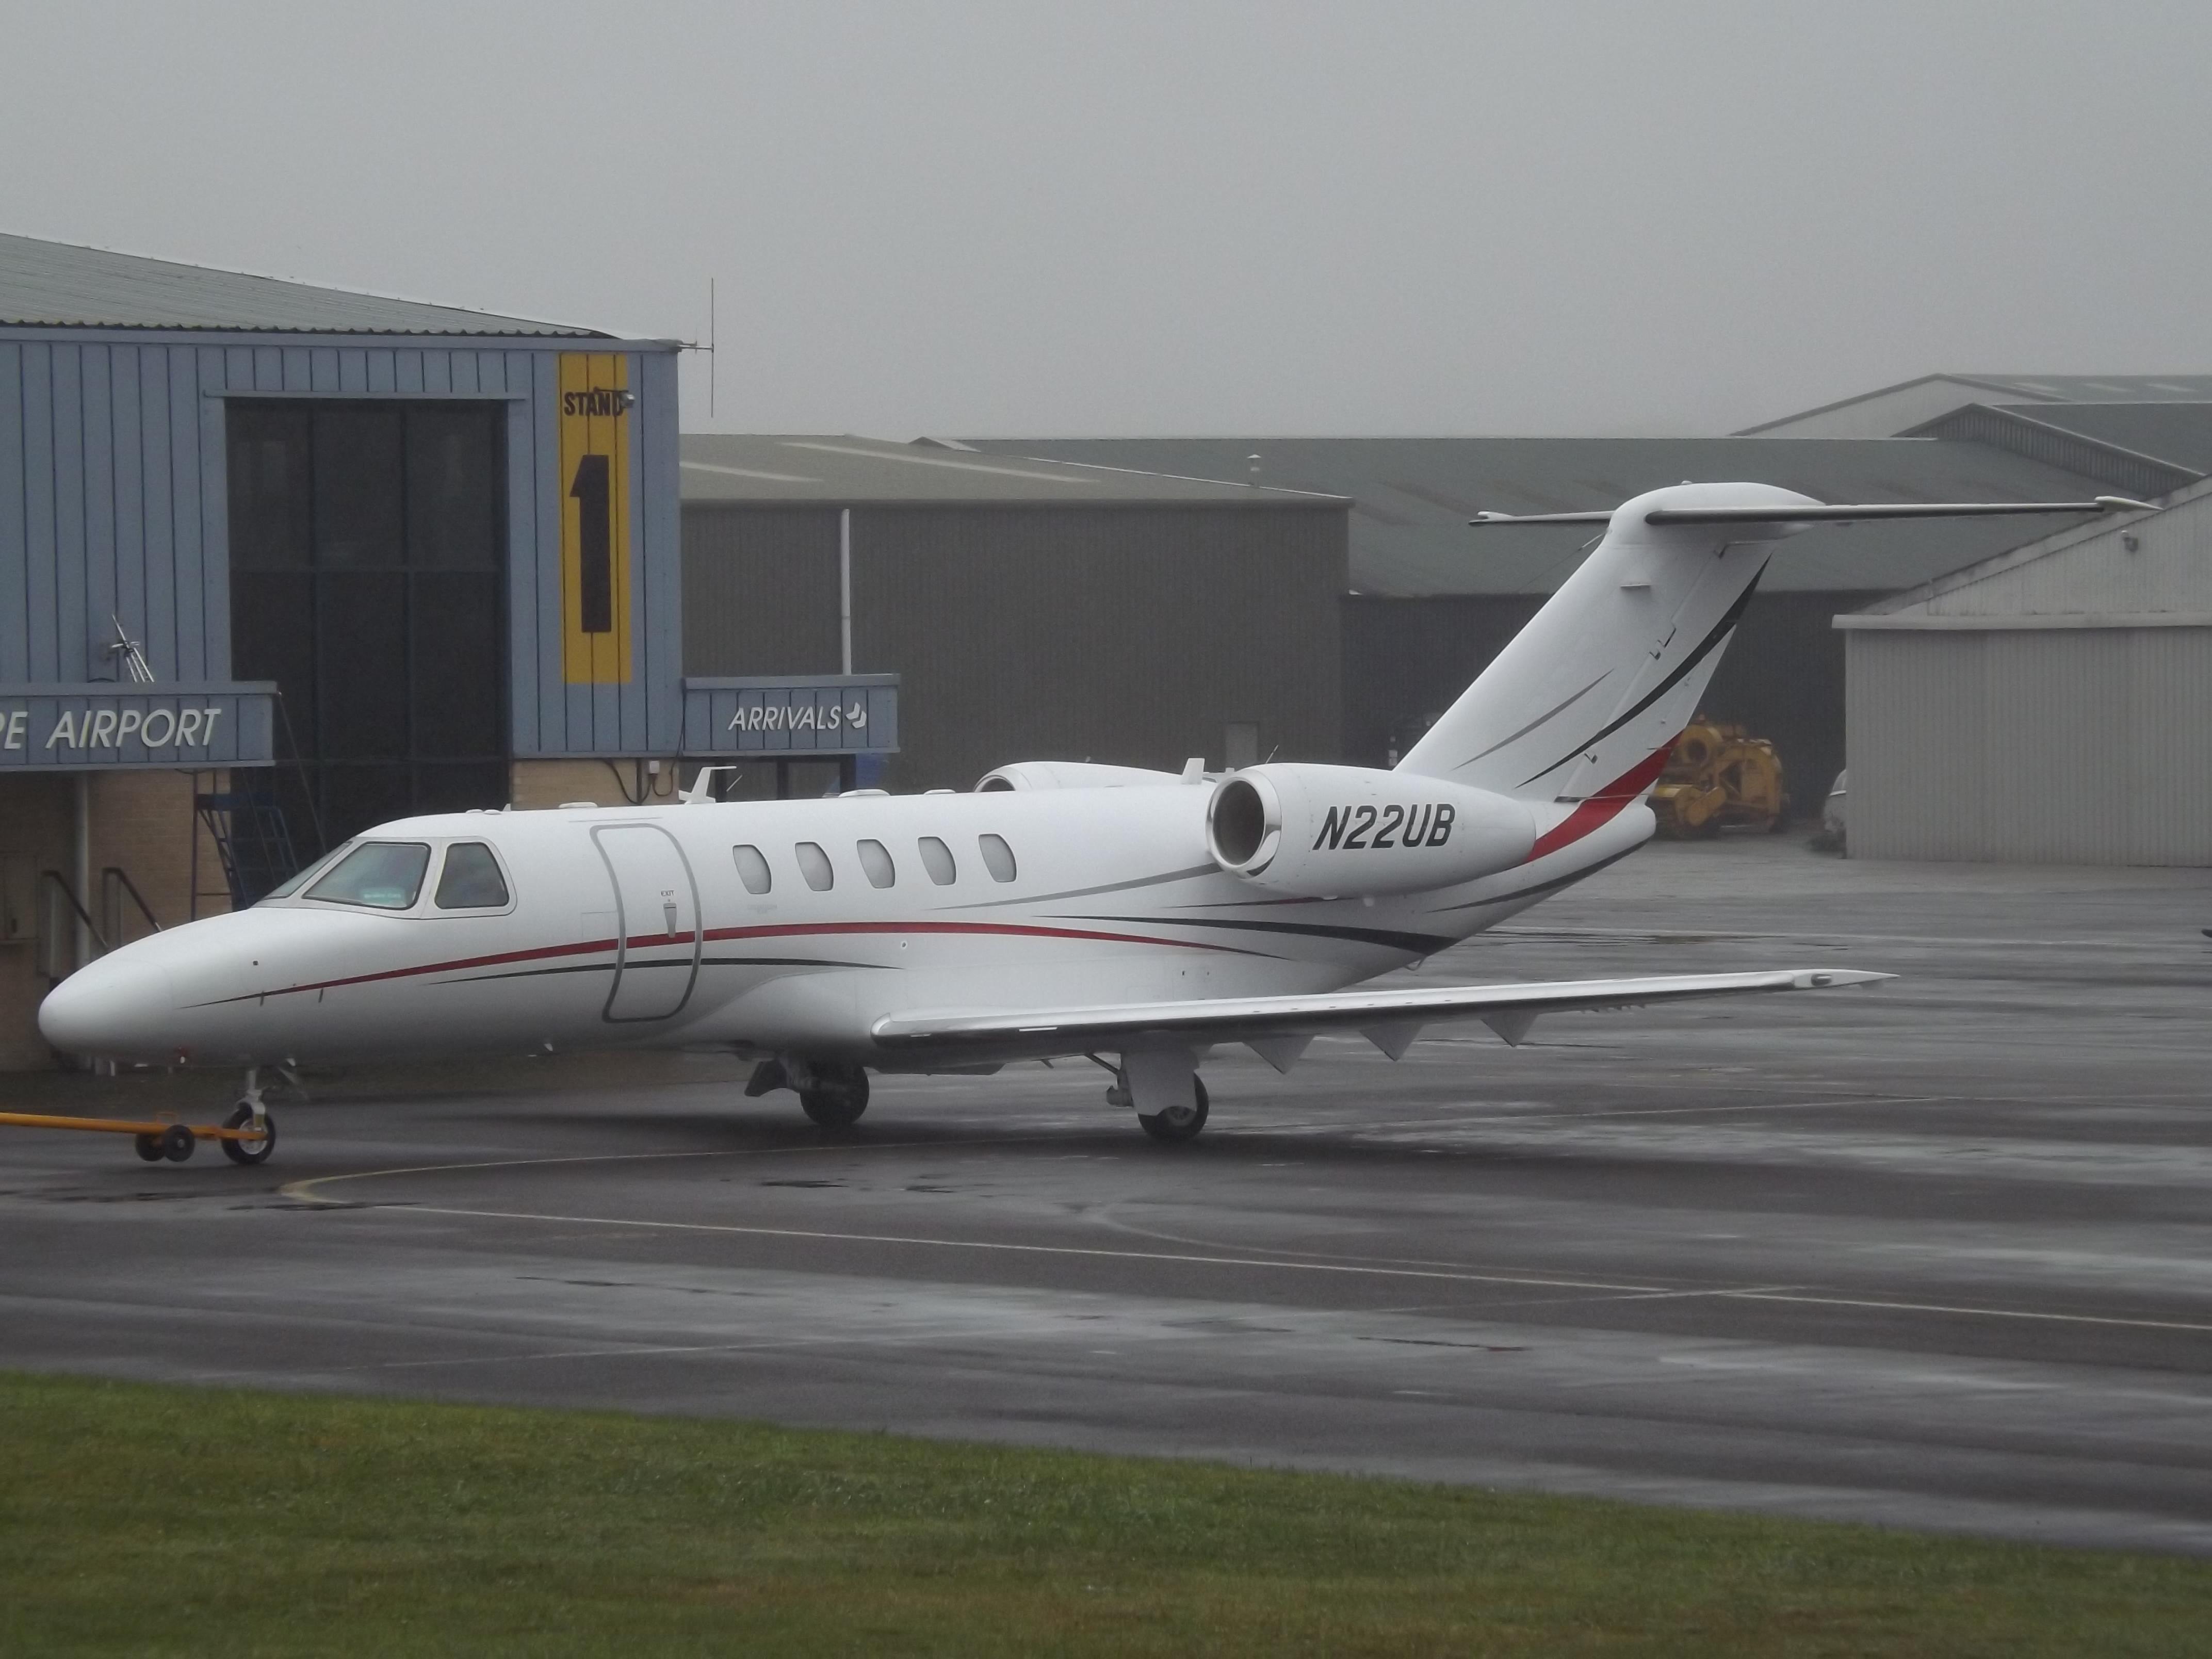 N22ub Jet Charter 525c Citation Cj4 Citation Cj4 C25c